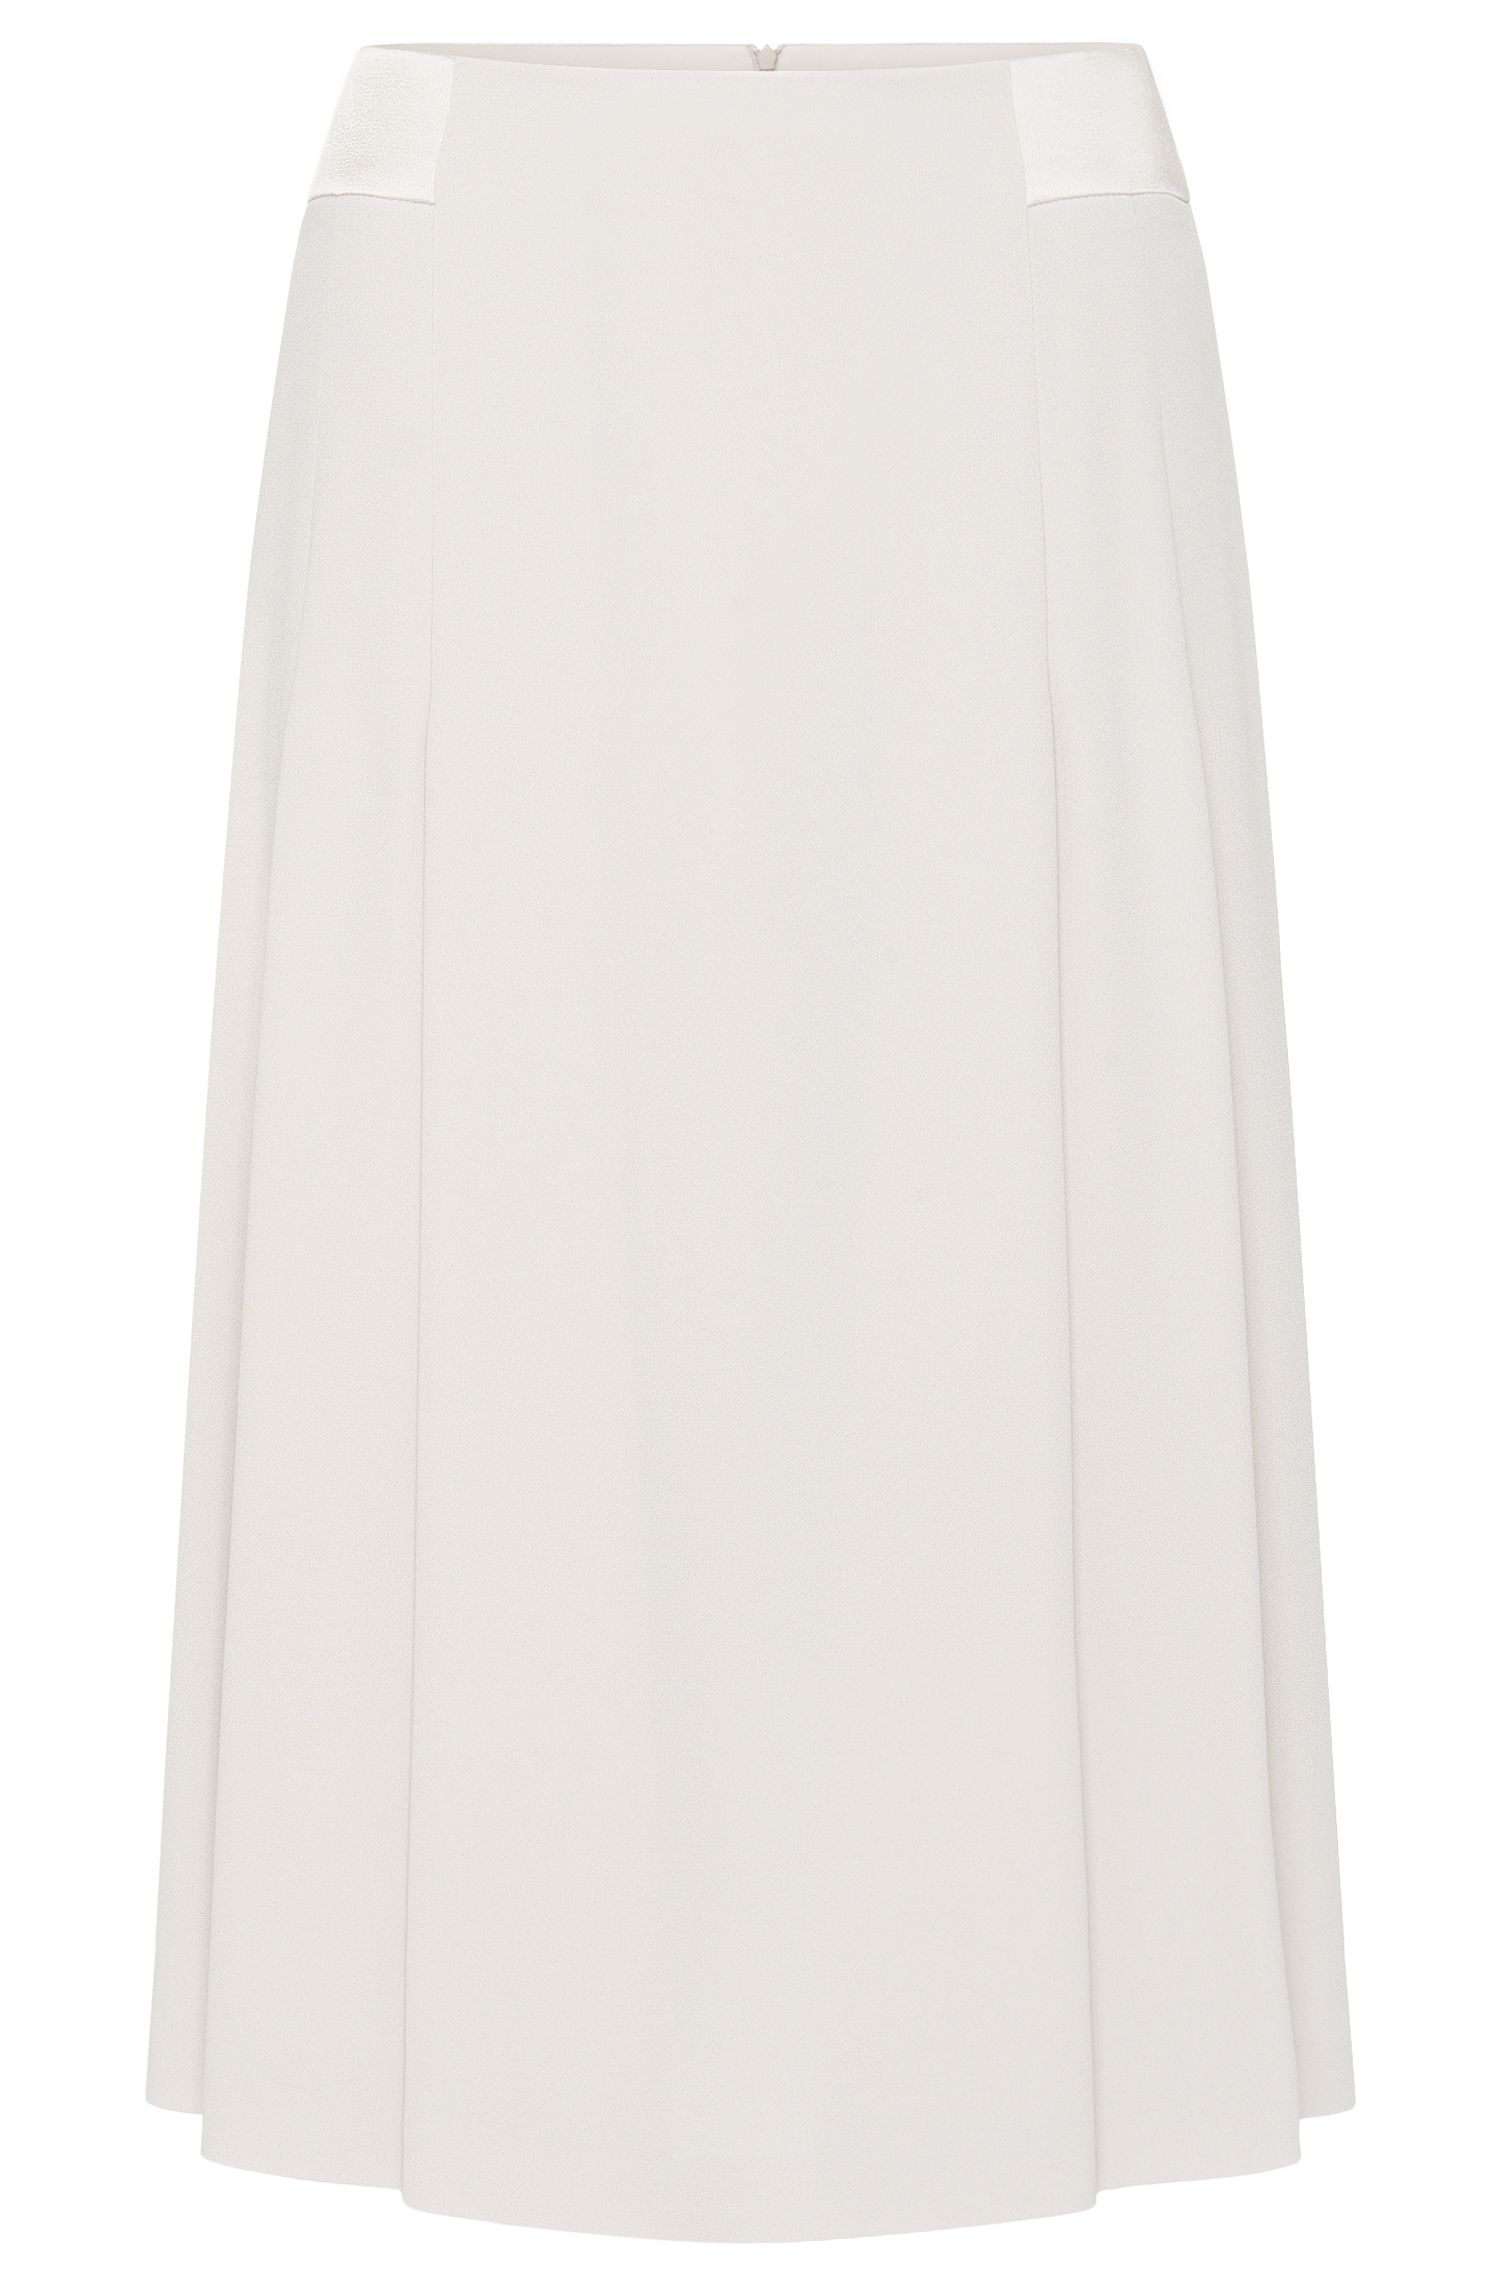 Plain-coloured midi skirt with a flared fit: 'Vibella'